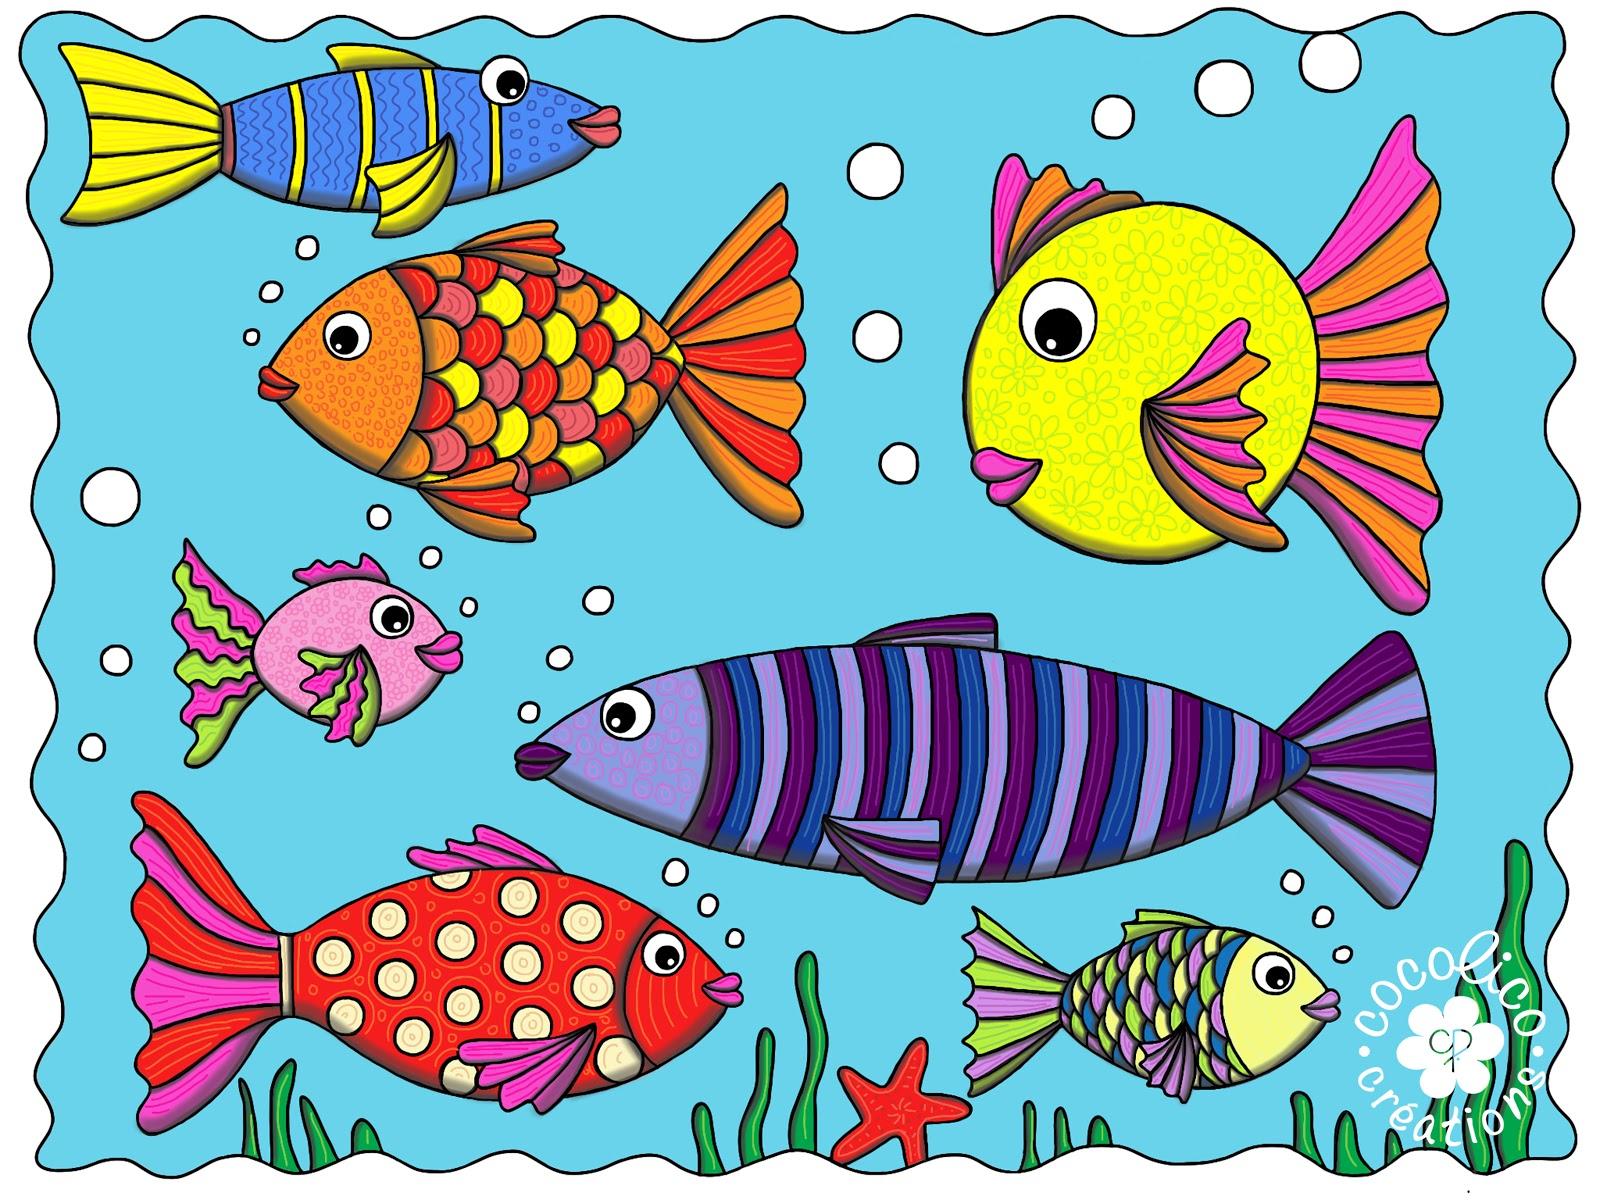 Cocolico creations illustrations - Poisson en dessin ...